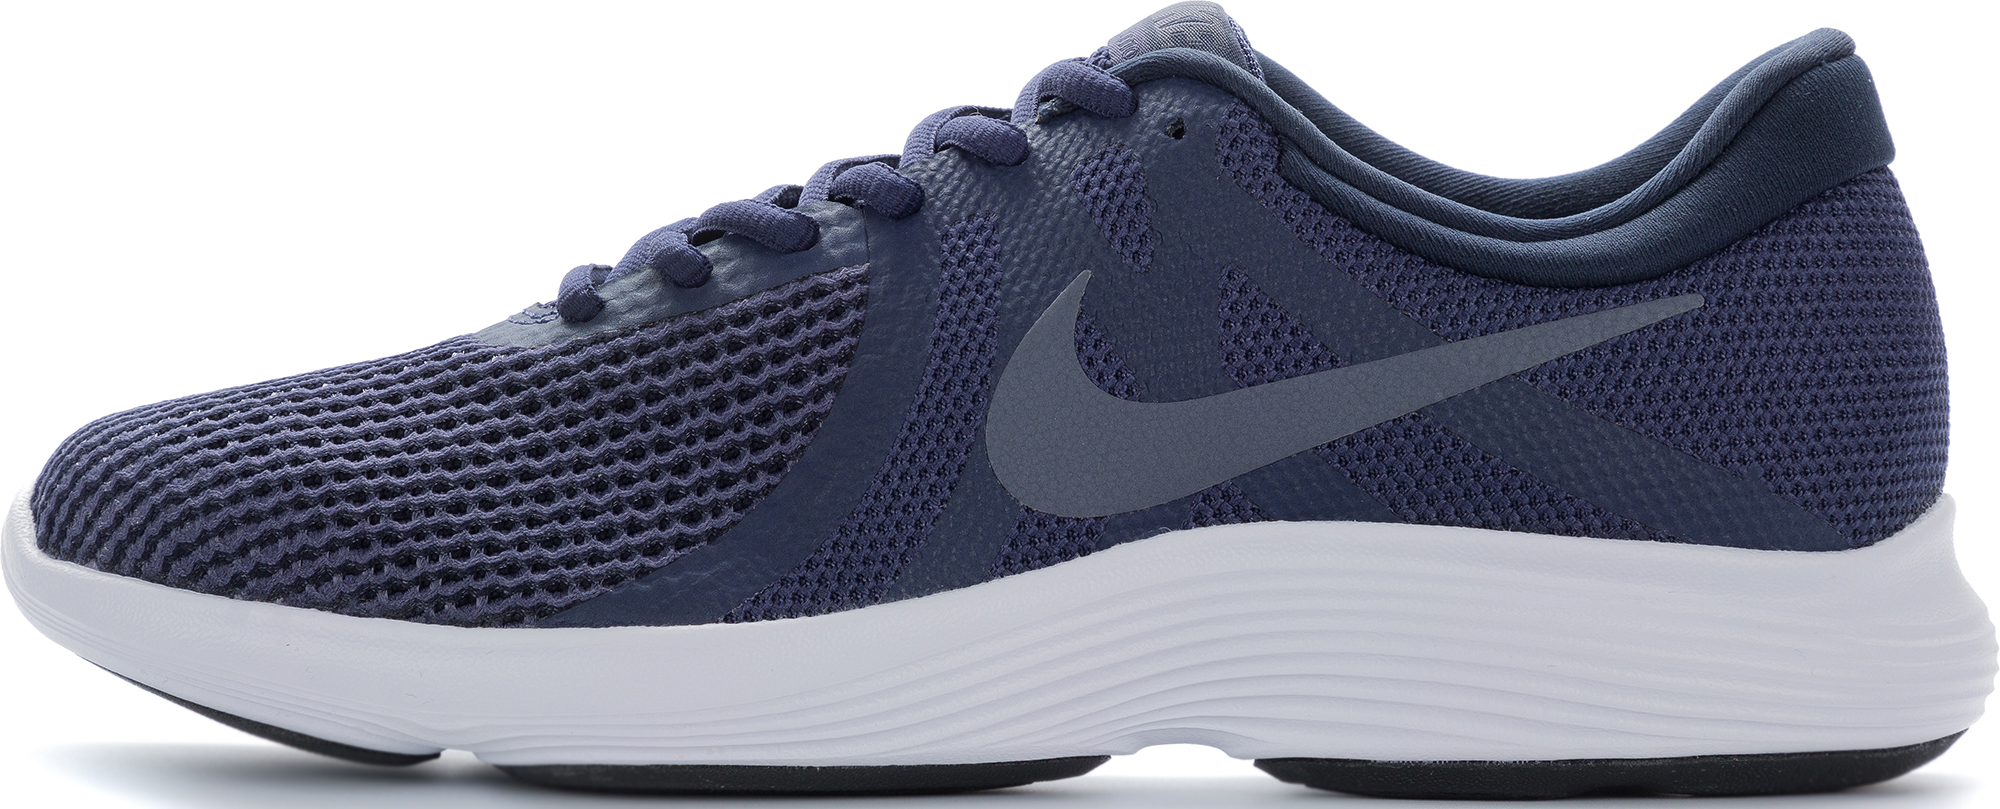 Nike Кроссовки мужские Nike Revolution 4, размер 44 nike боксерки мужские nike machomai размер 44